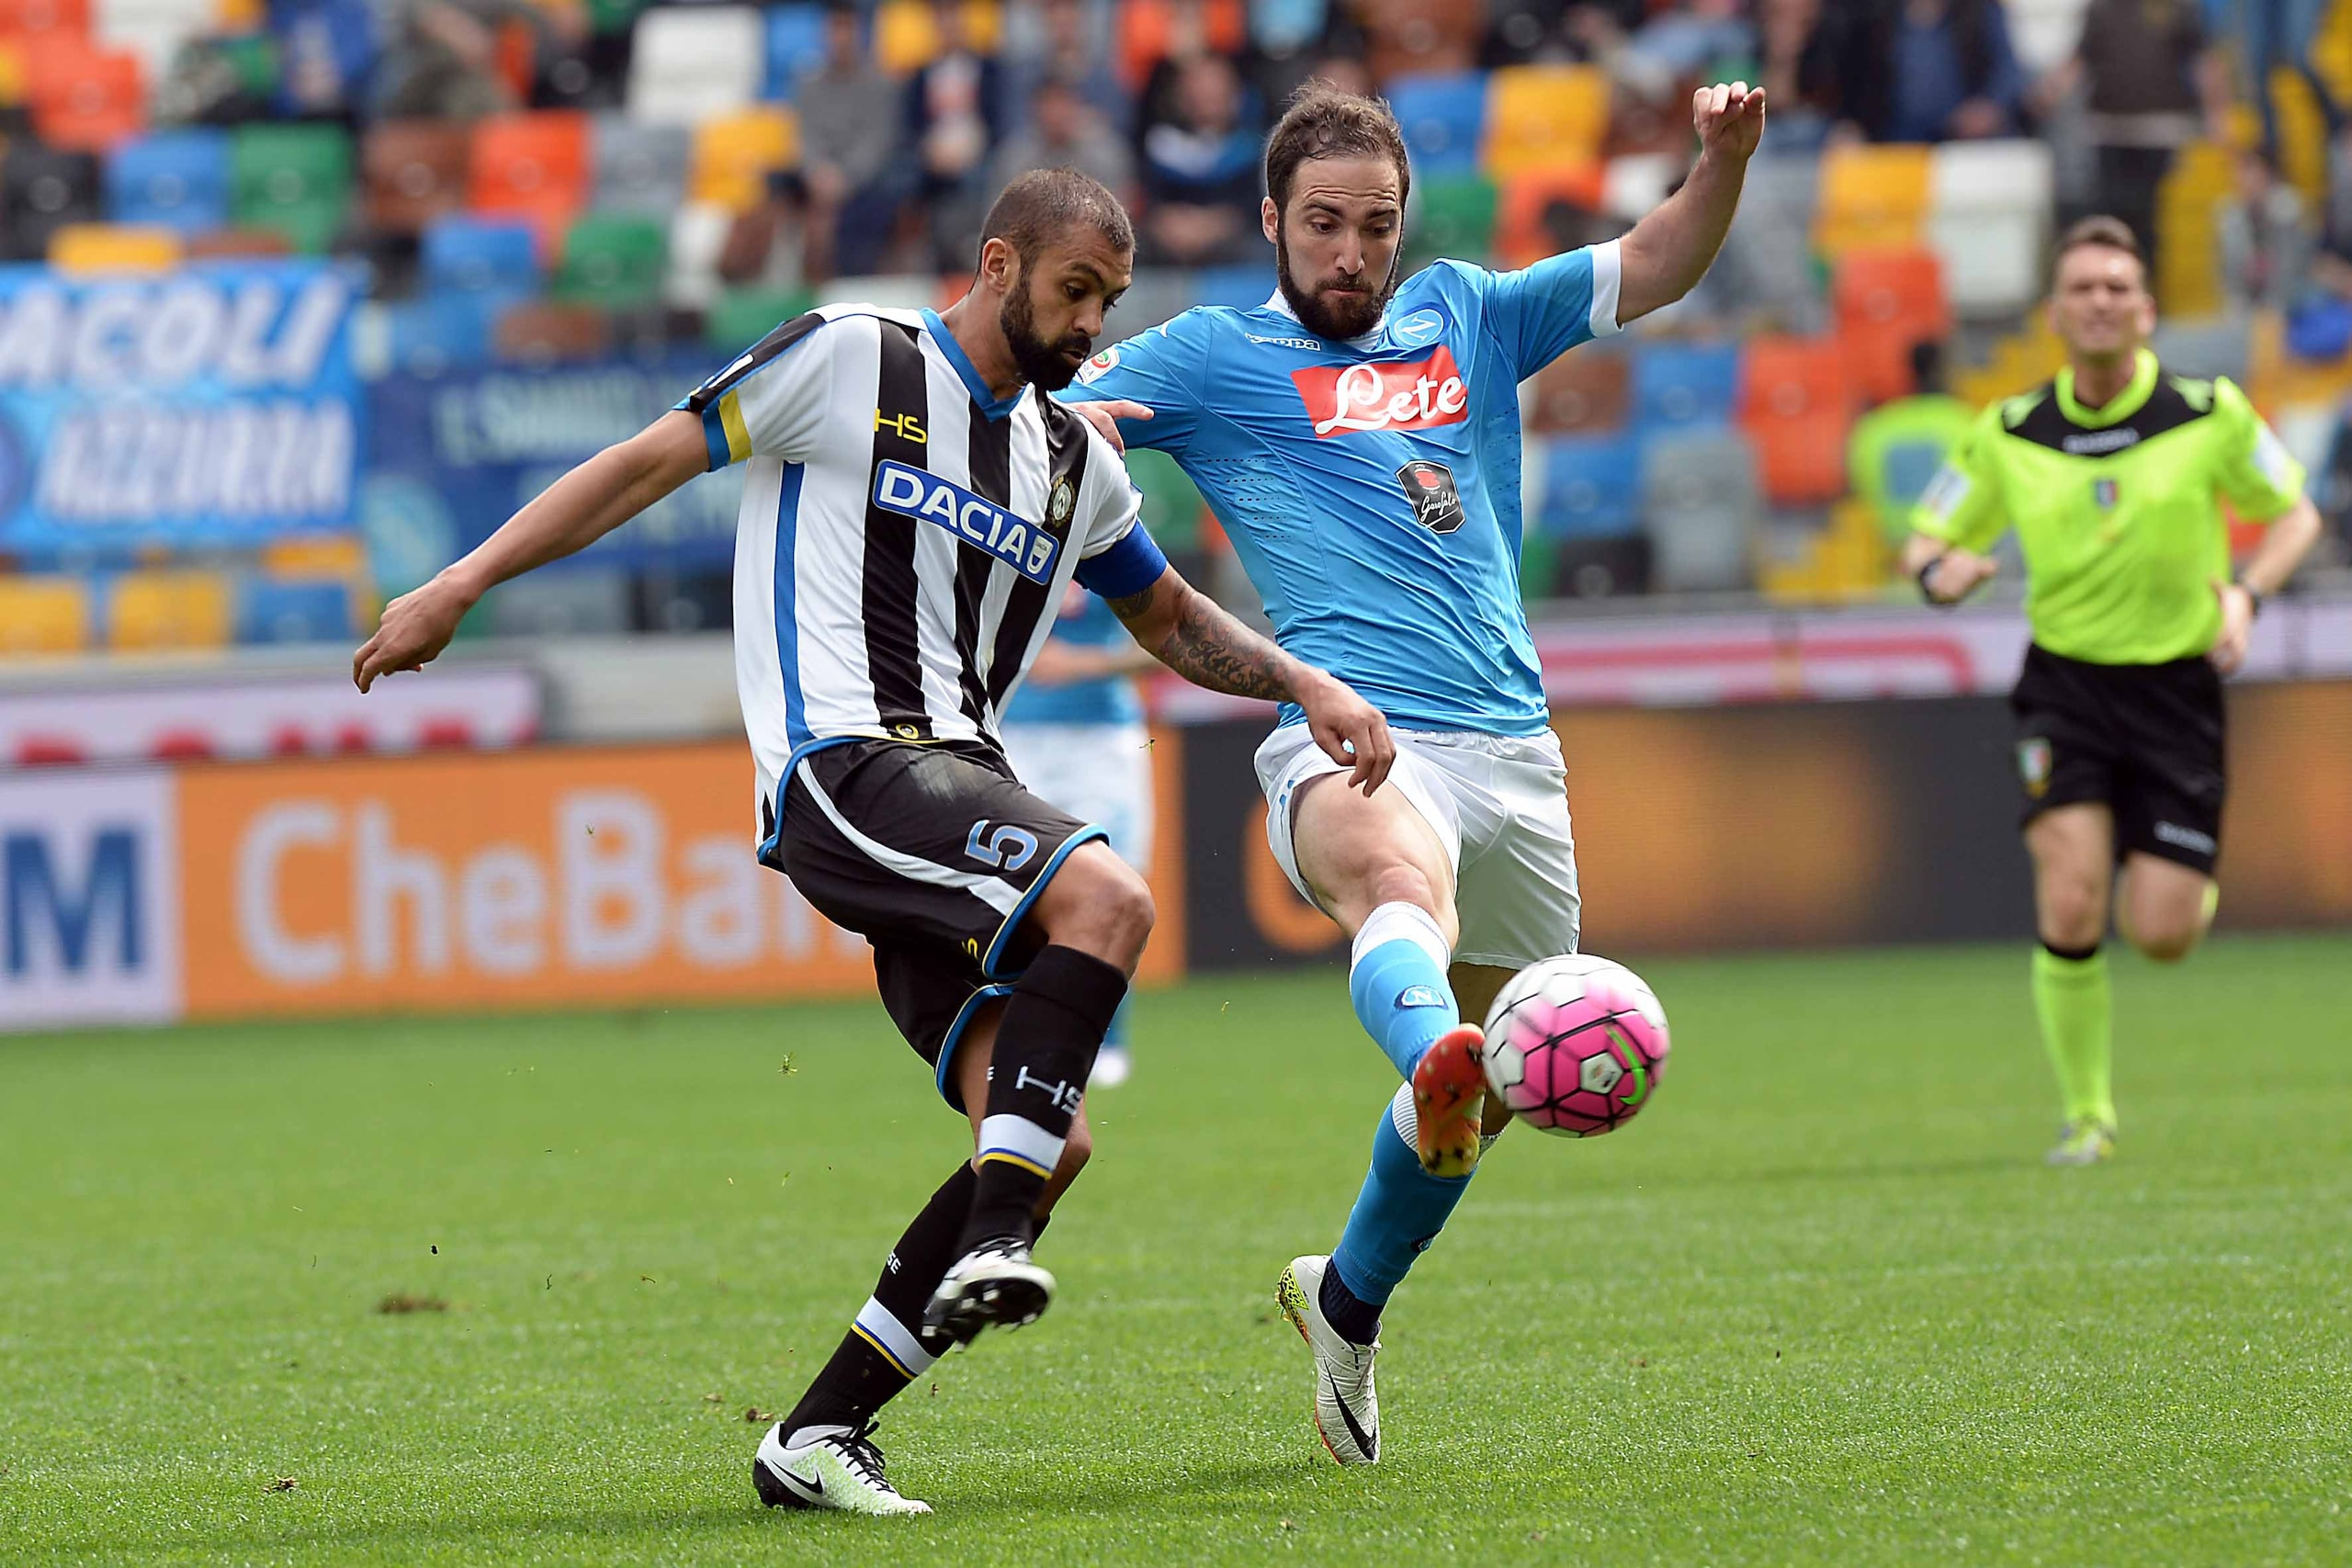 Udinese-Napoli 3-1: Higuain e Sarri espulsi, gli azzurri crollano